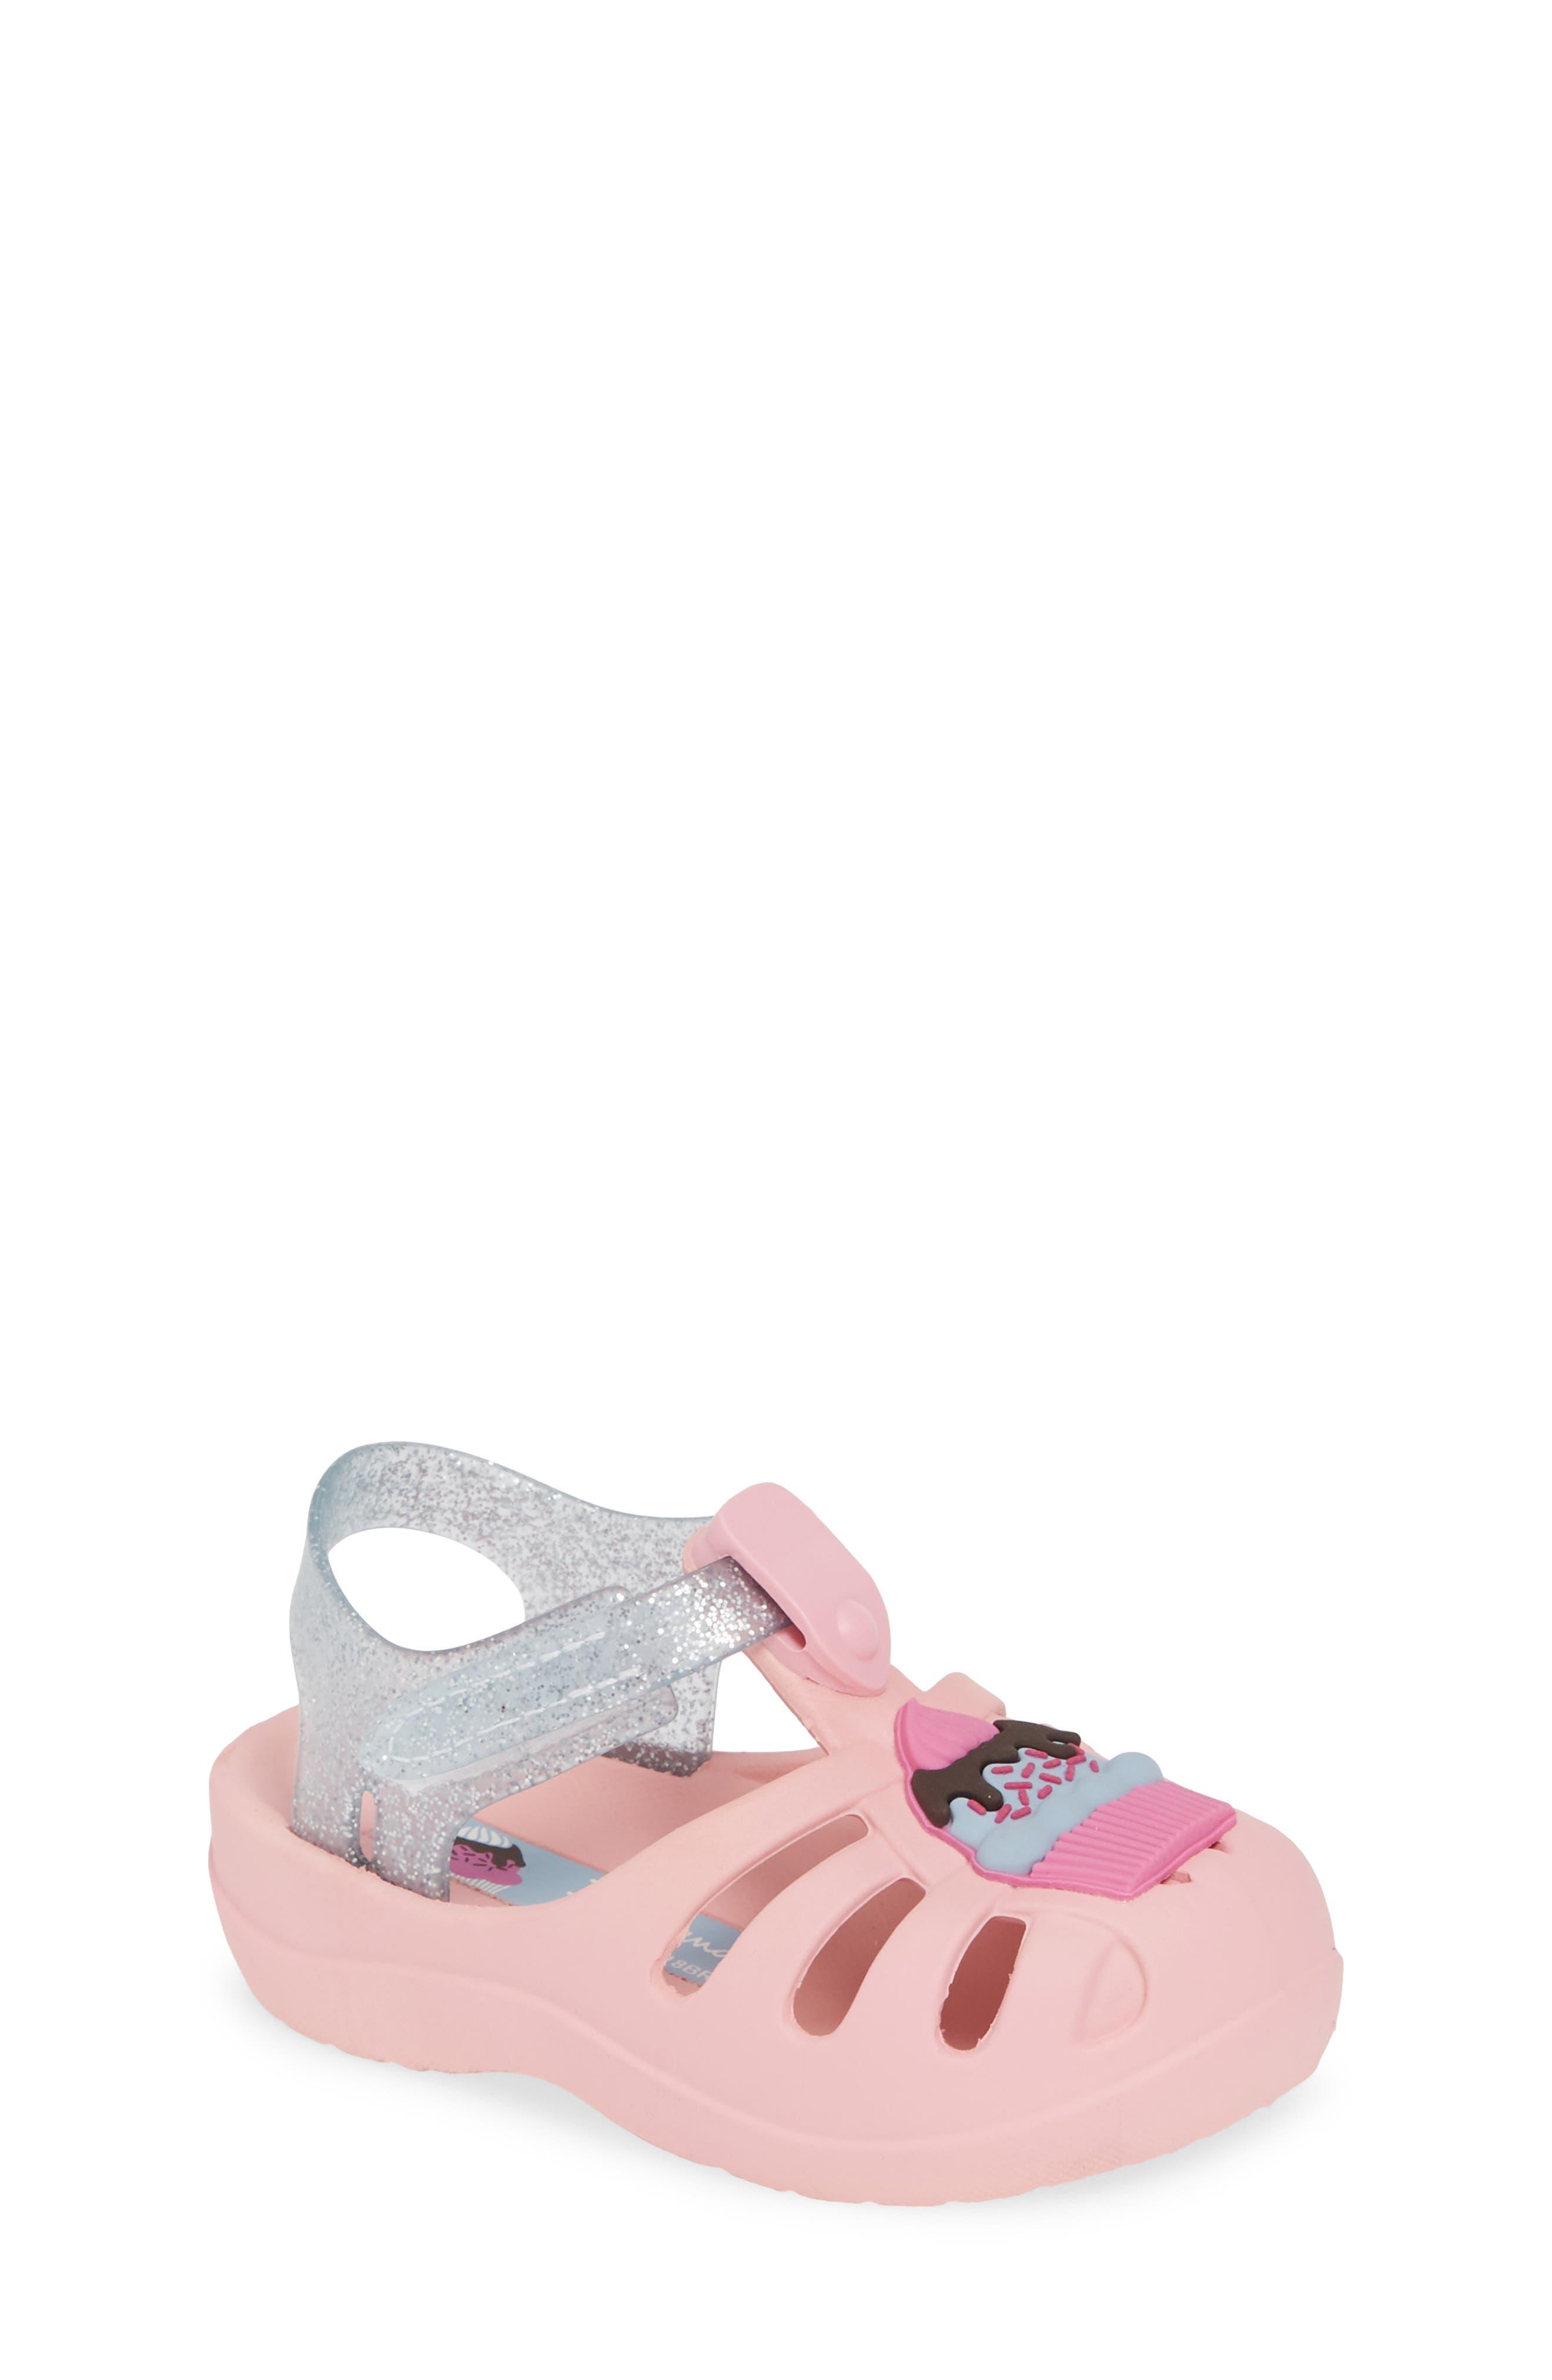 131d889bda902 Kids' Ipanema Shoes | Nordstrom